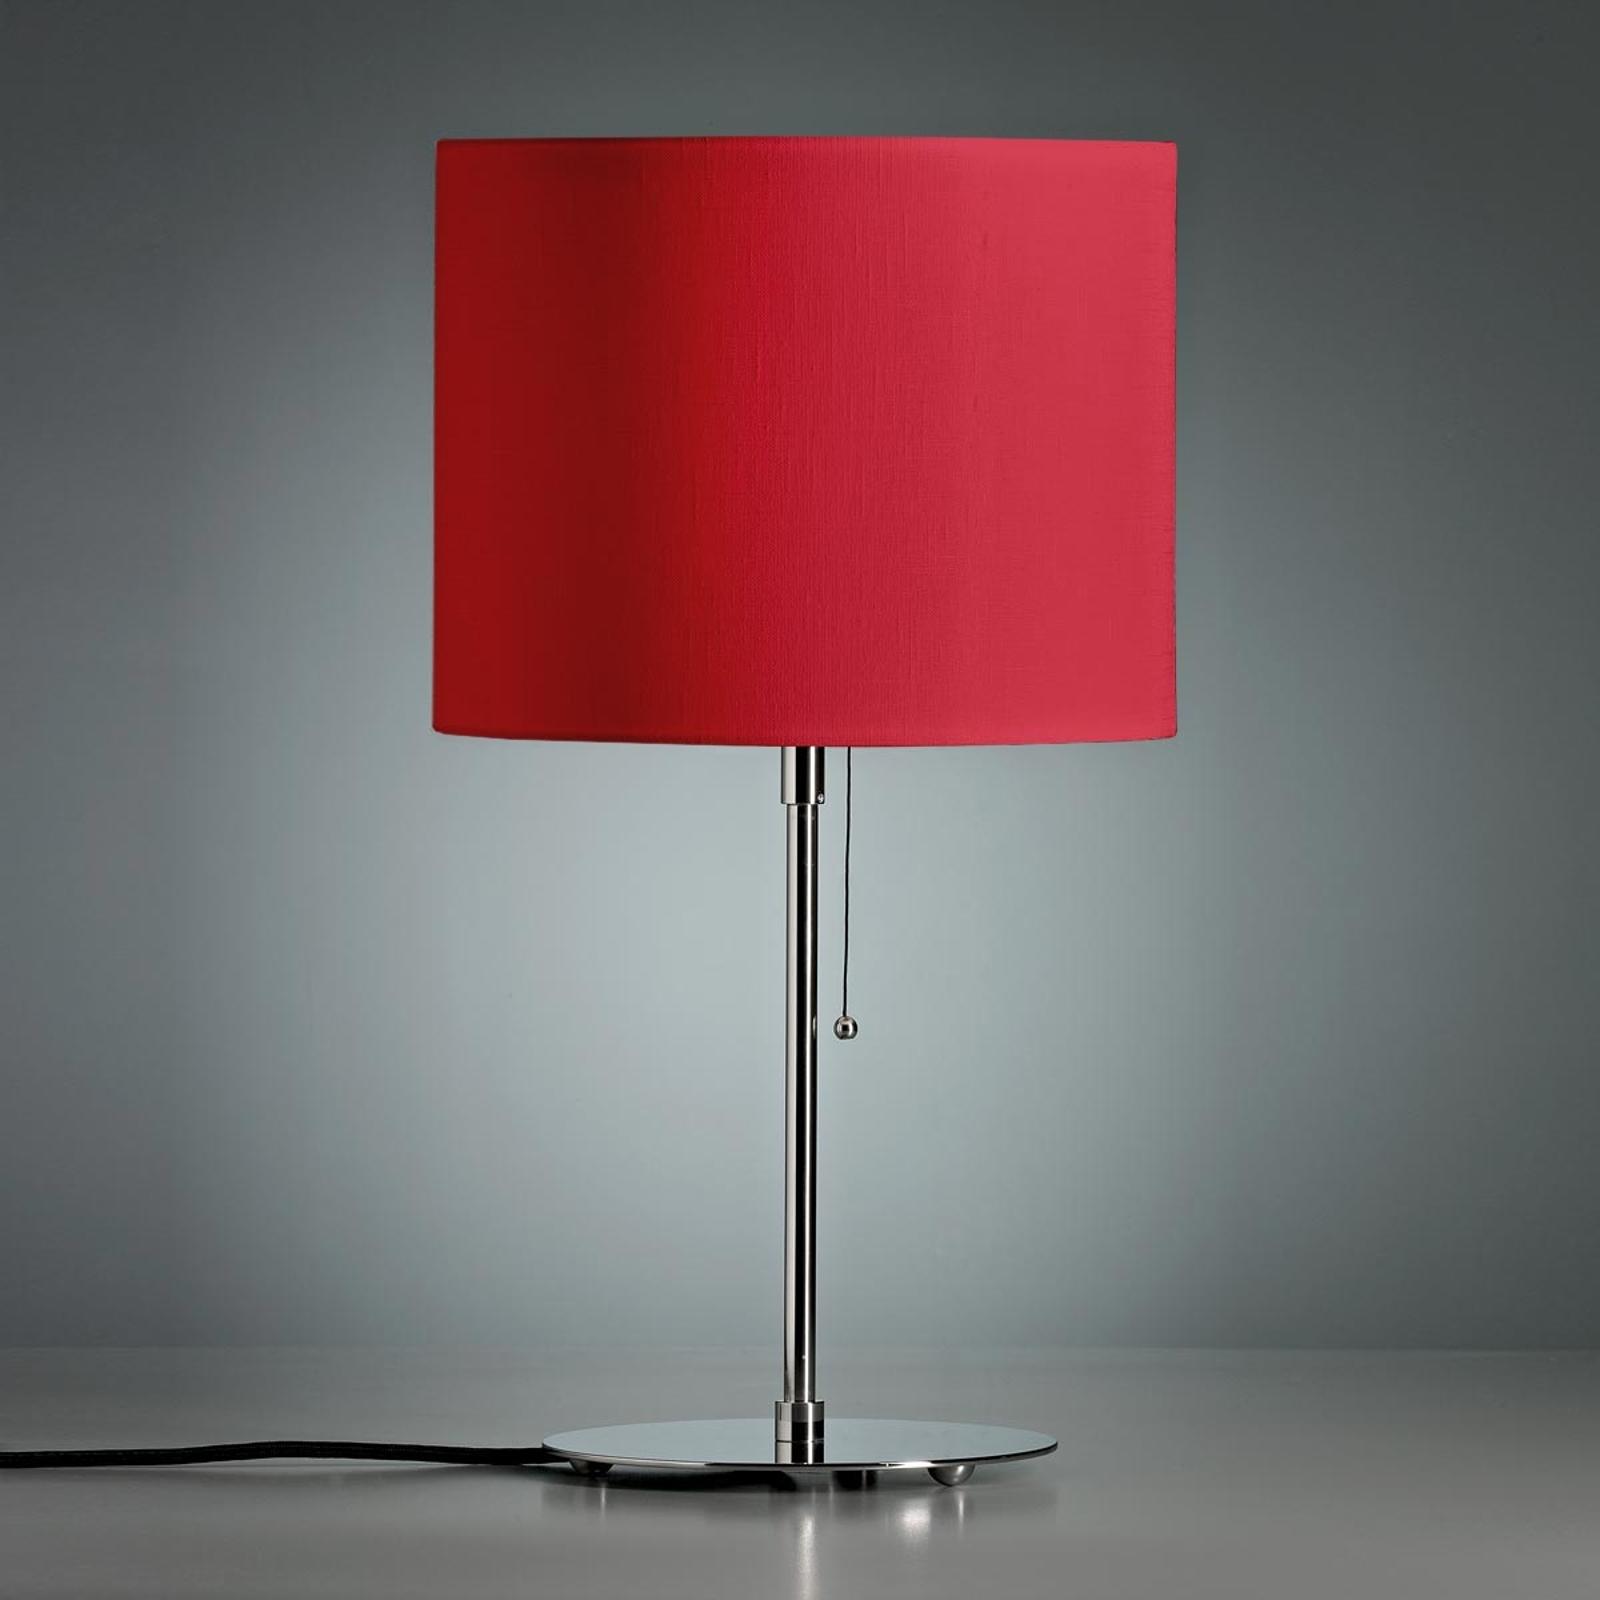 Tafellamp met gekleurde linnen kap, rood